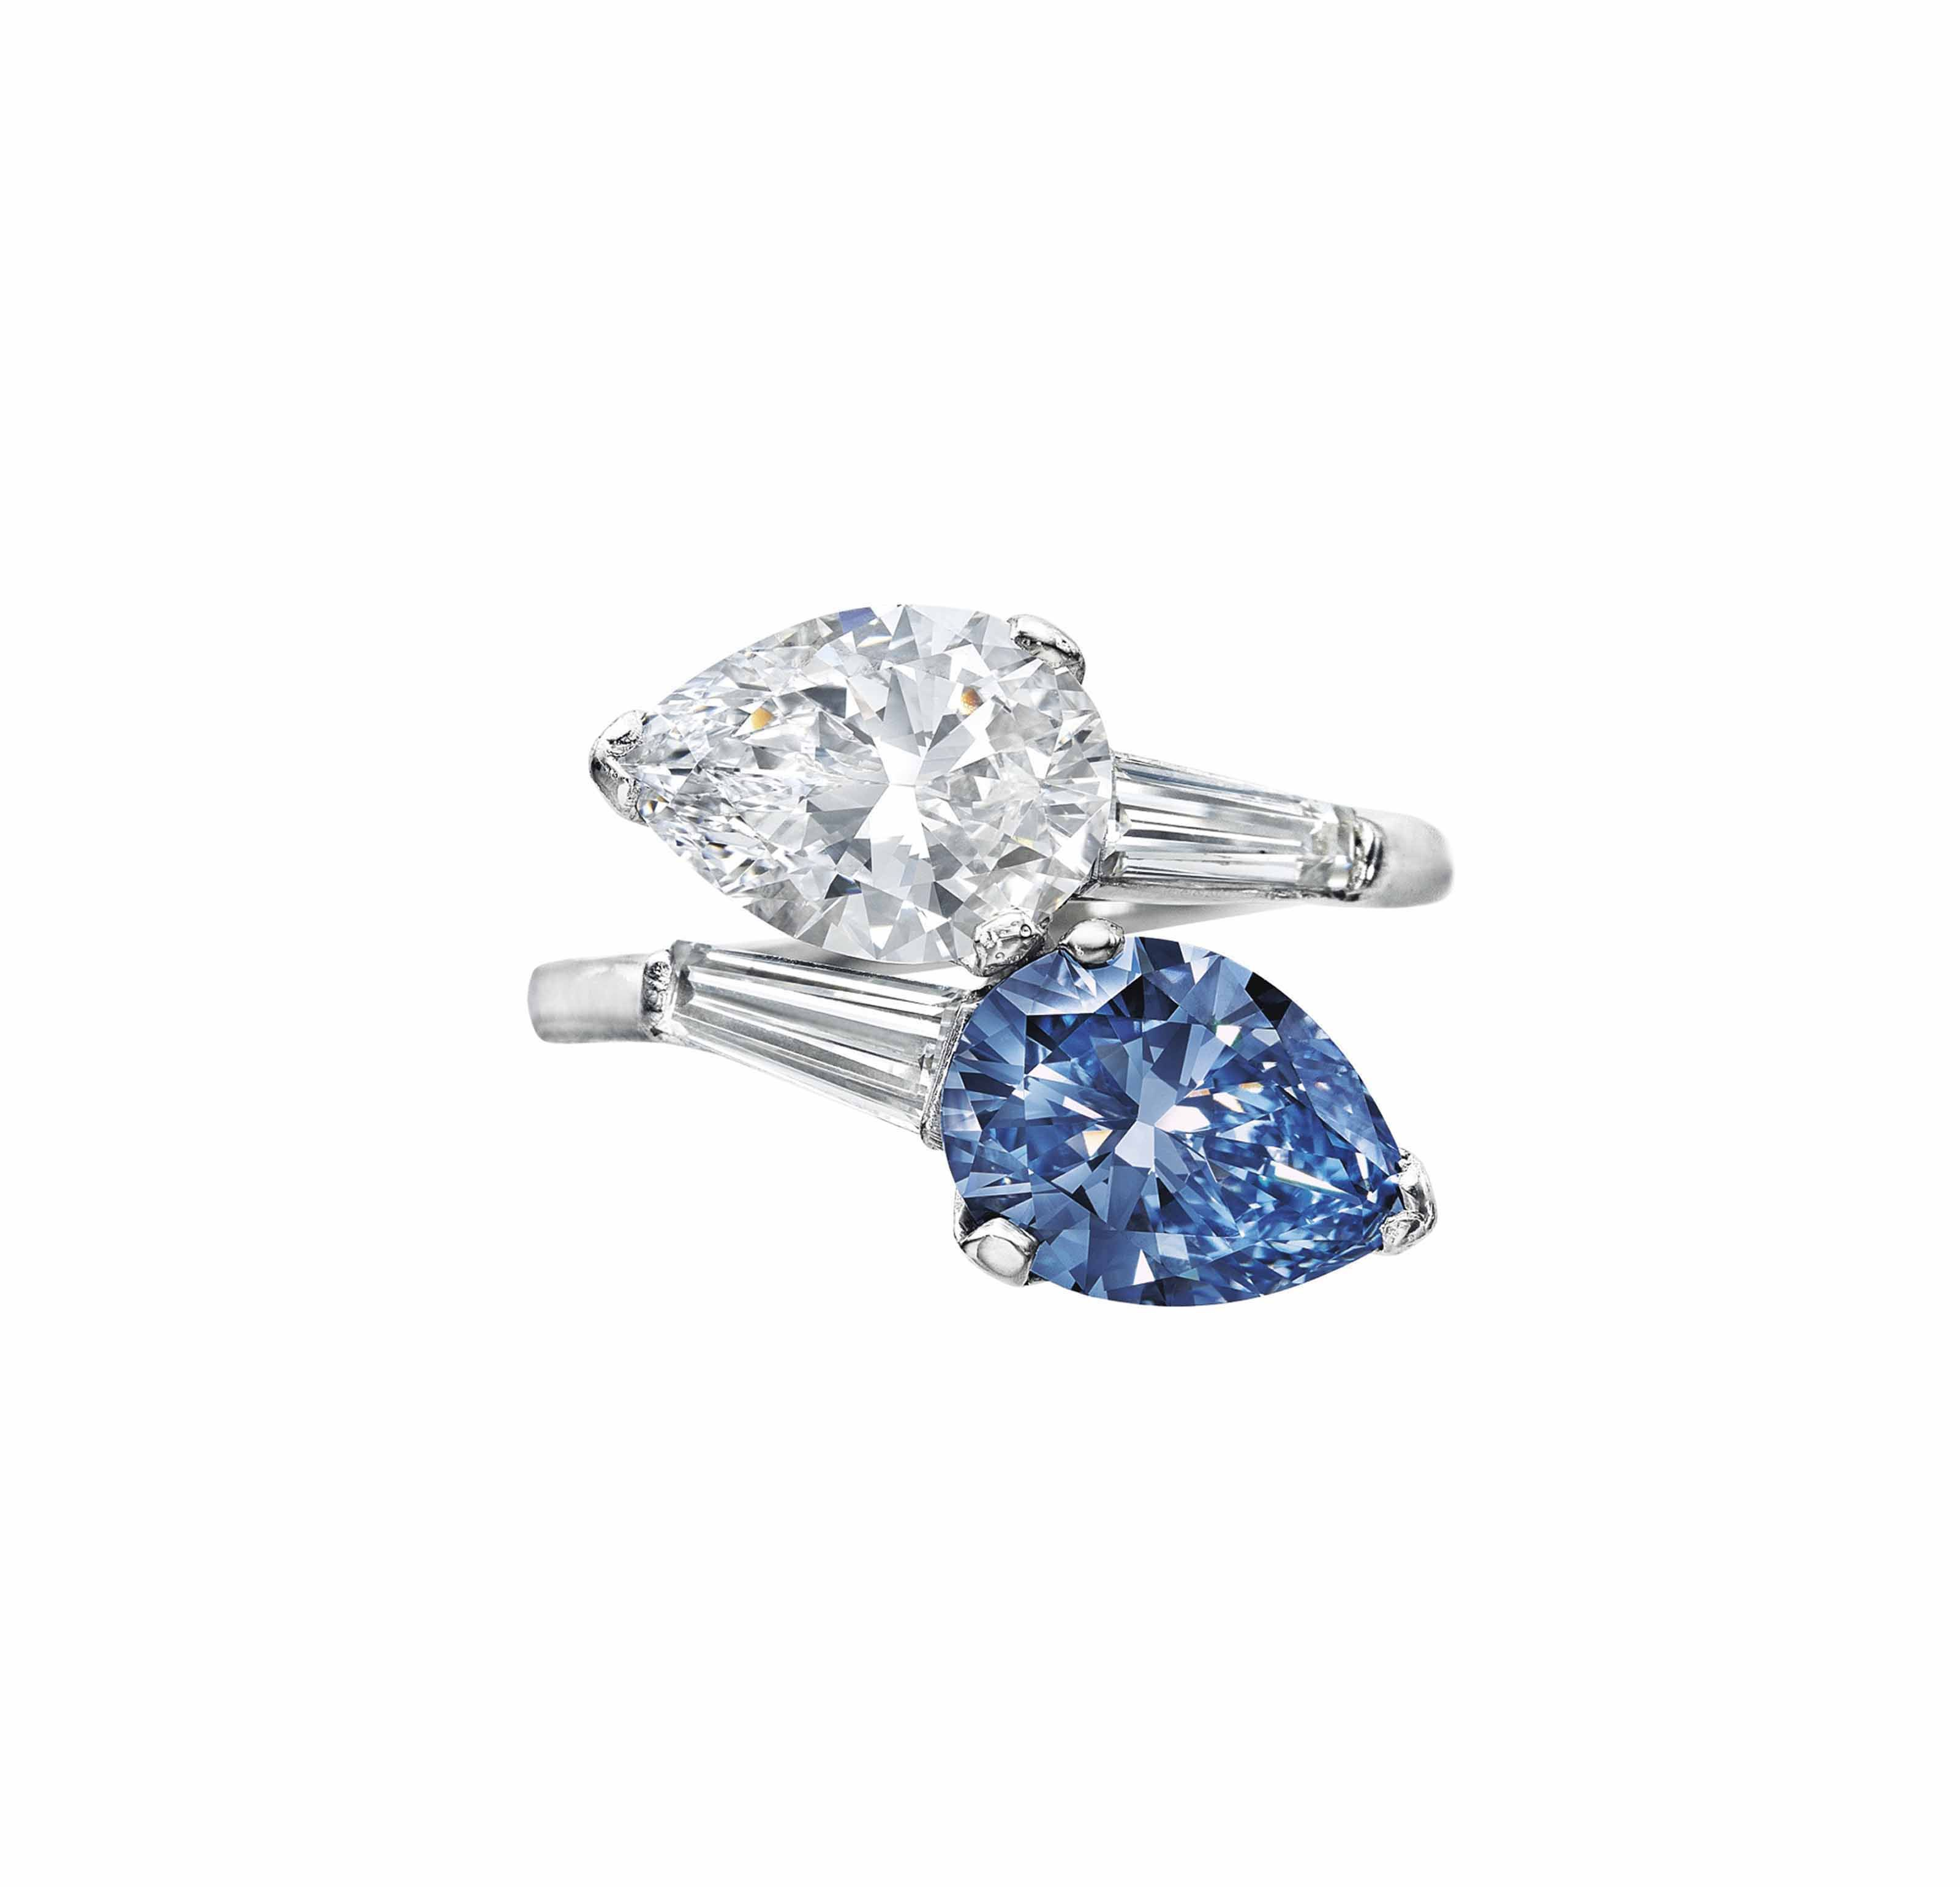 A Superb Twin Stone Colored Diamond And Diamond Ring Ring Colored Diamond Christie S In 2020 Gemstones Jewelry Rings Diamond Rings With Price Colored Diamonds